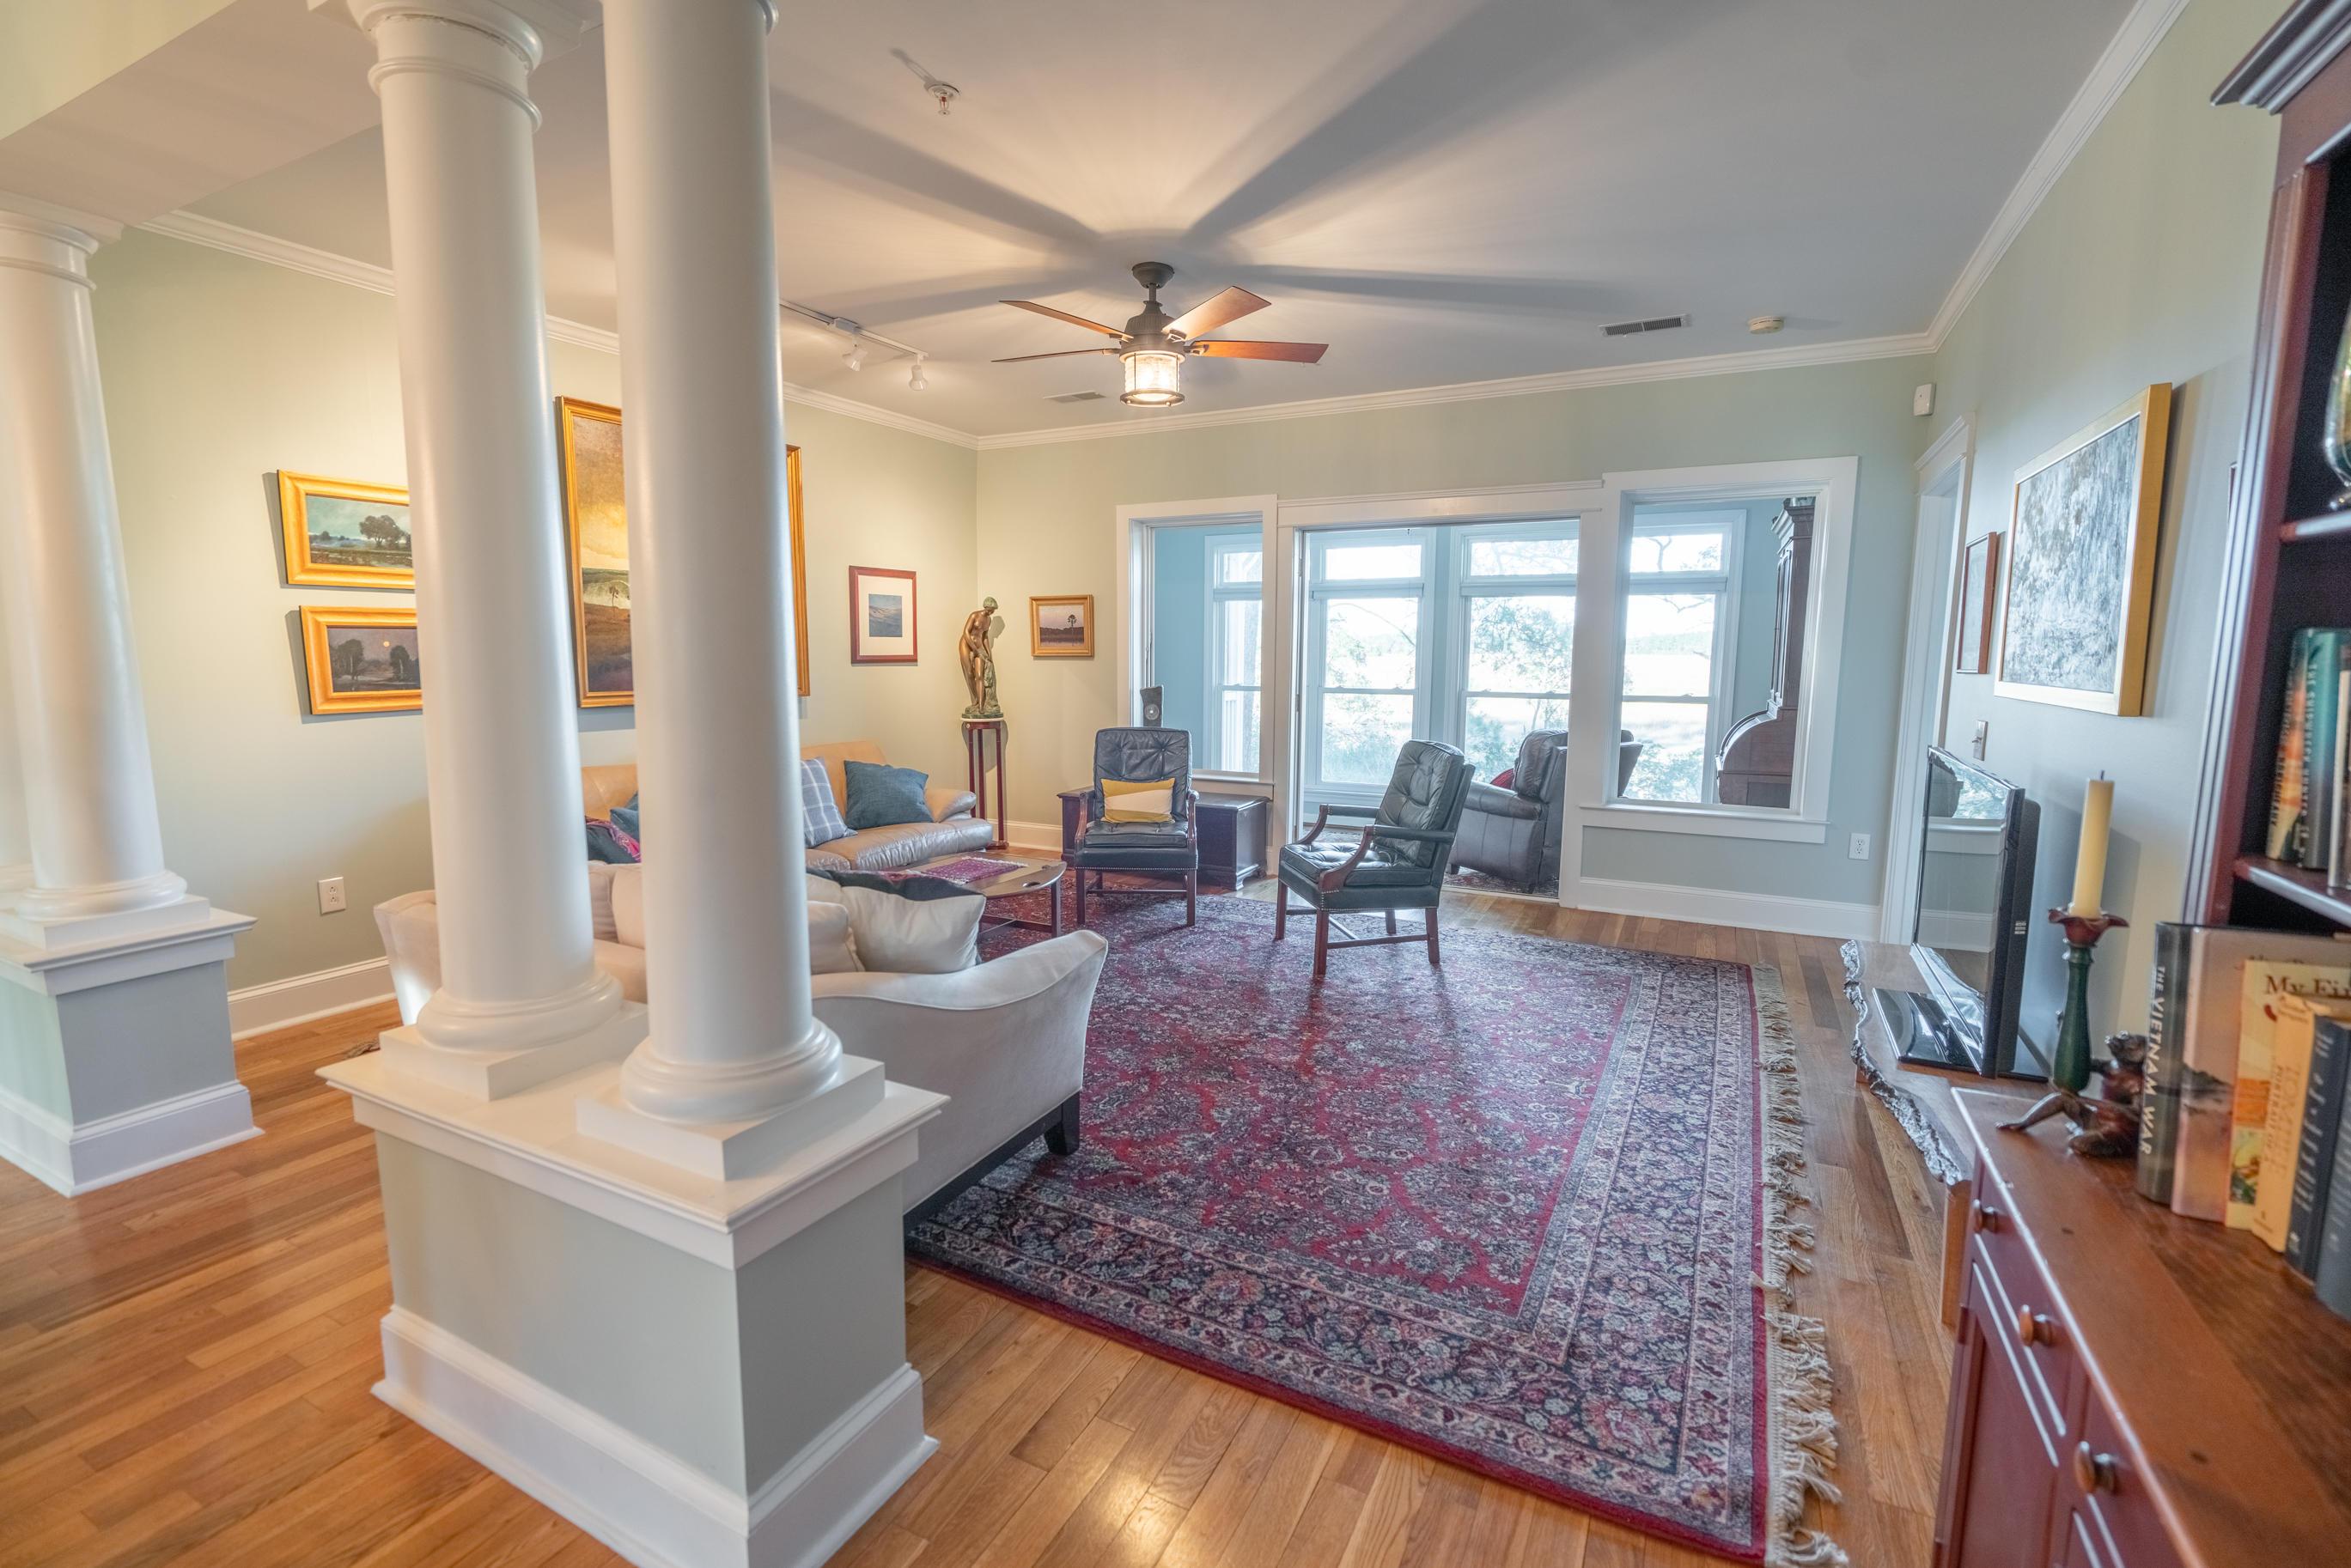 Etiwan Pointe Homes For Sale - 132 Winding Creek, Mount Pleasant, SC - 21